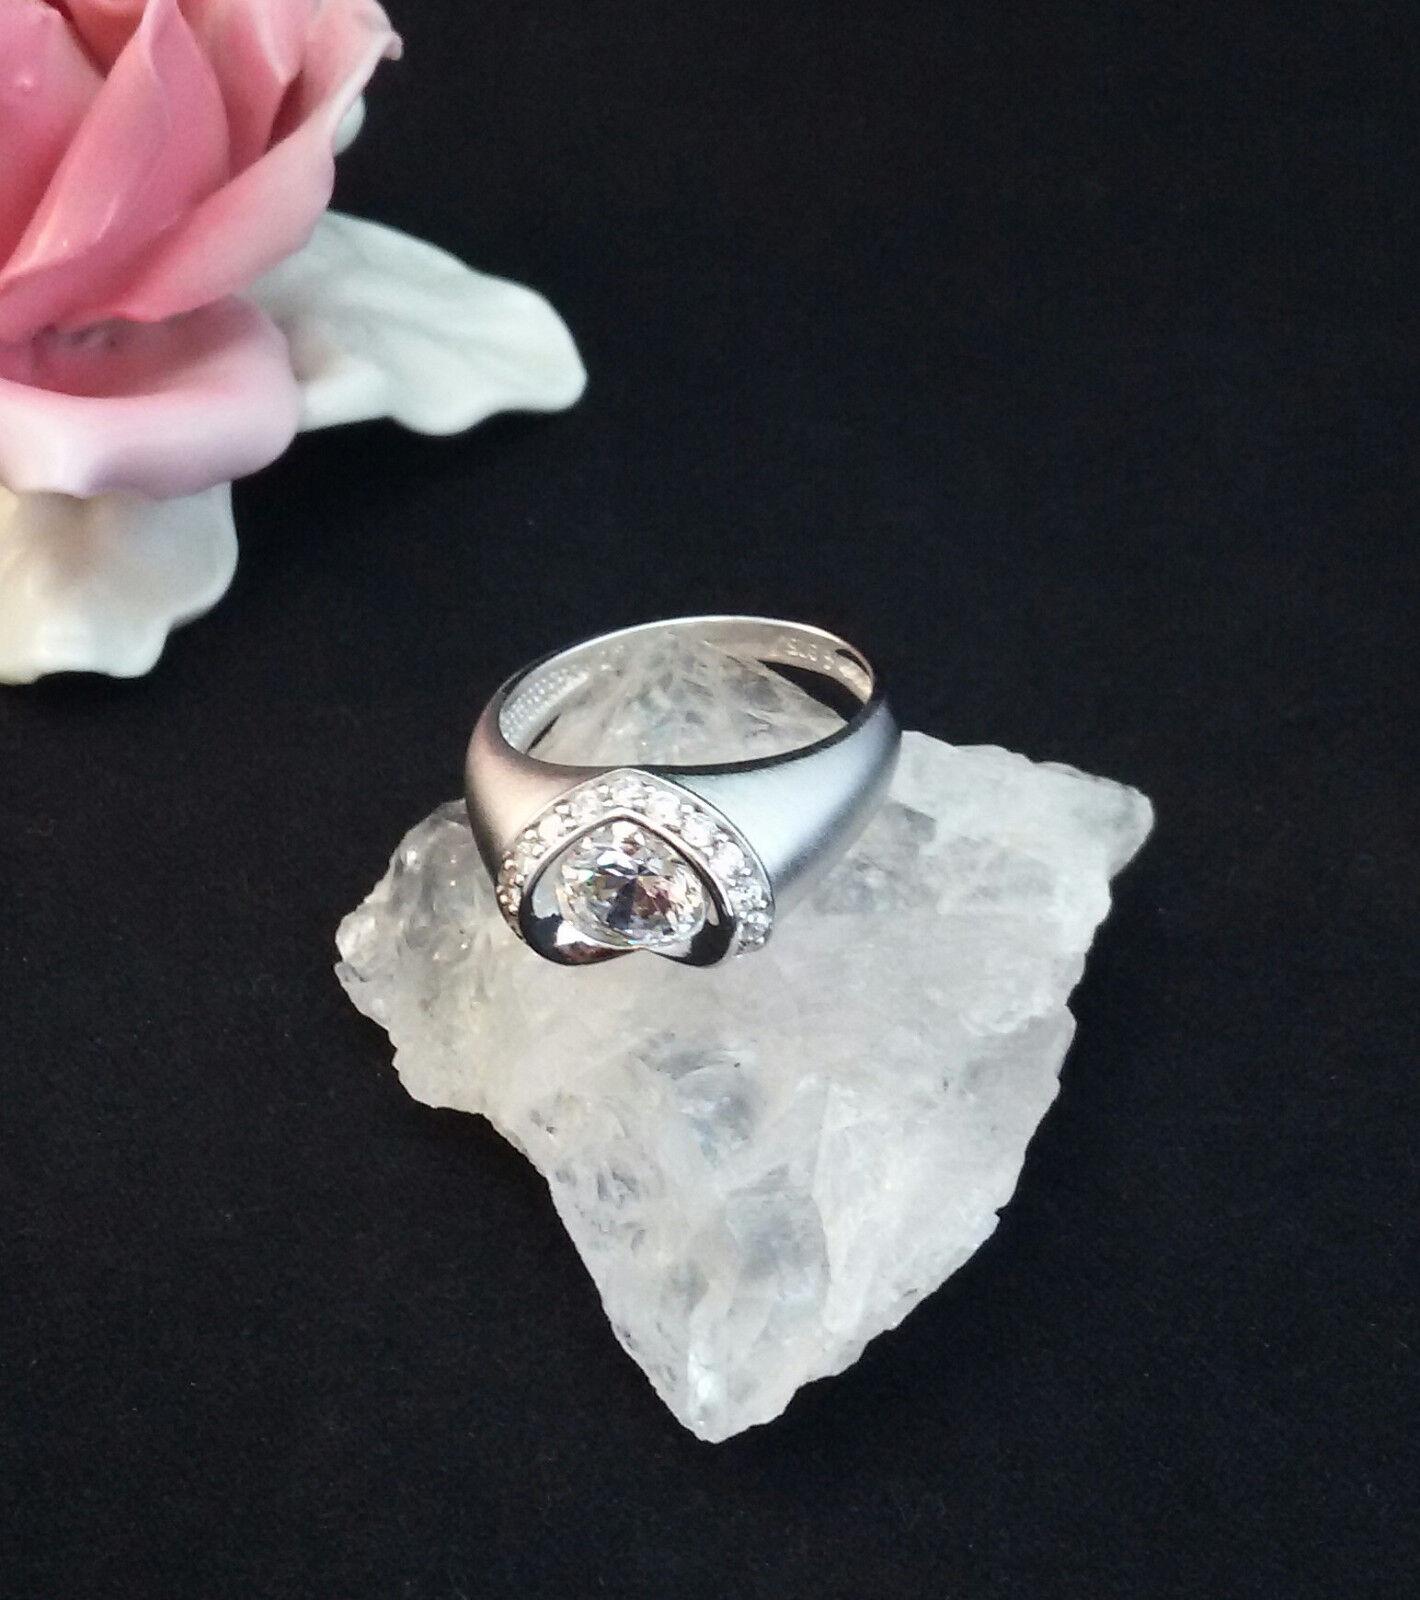 Ring silver 925 Rodiniert Zirkonia 60 (19,1 mm Ø)